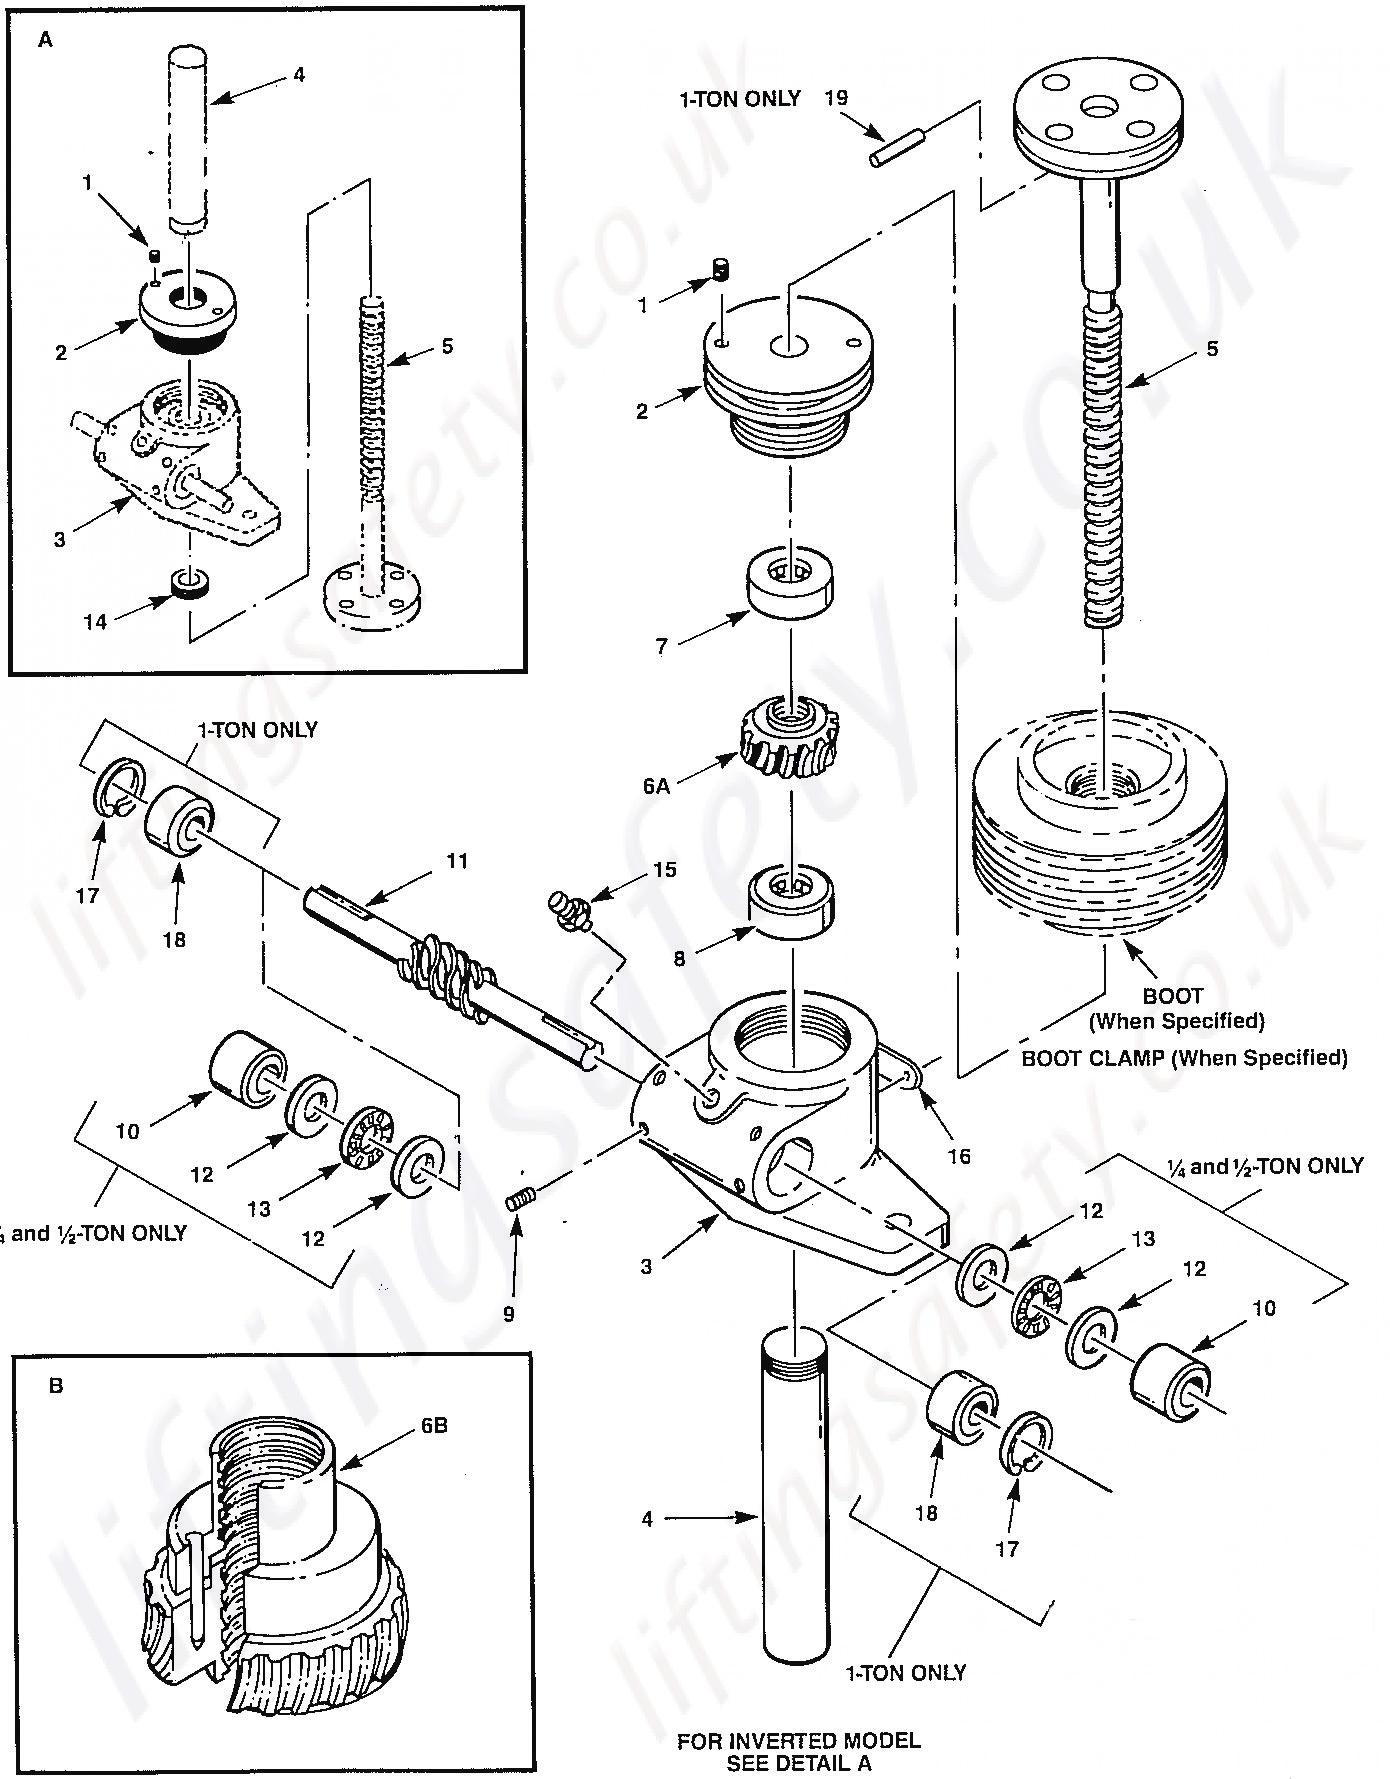 Machine Screwjack Actuator 1 4t To 1t